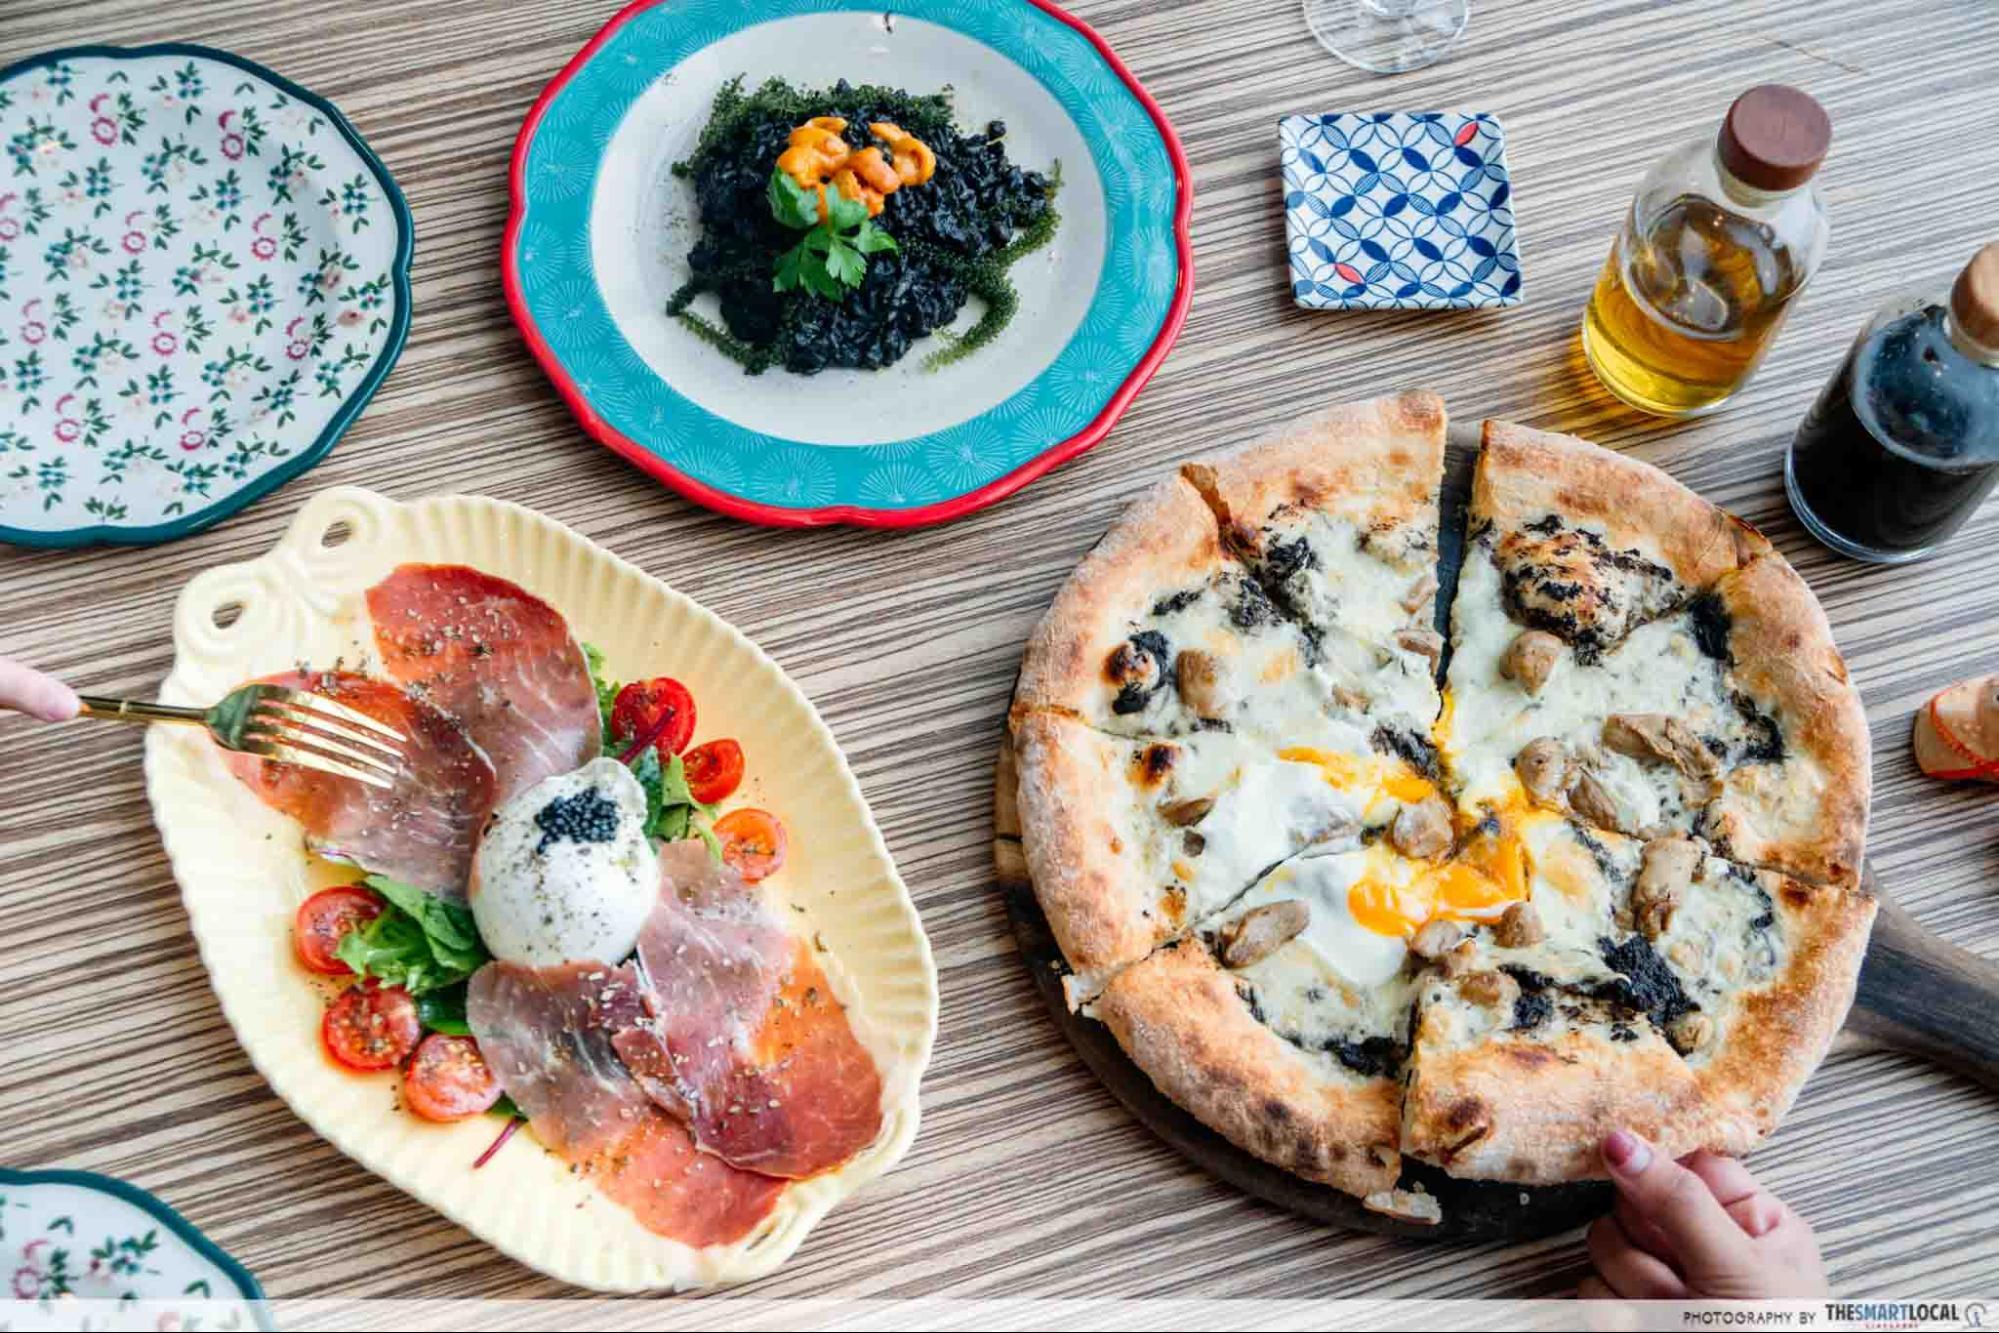 Italian Food in Singapore - Ristorante Palermo